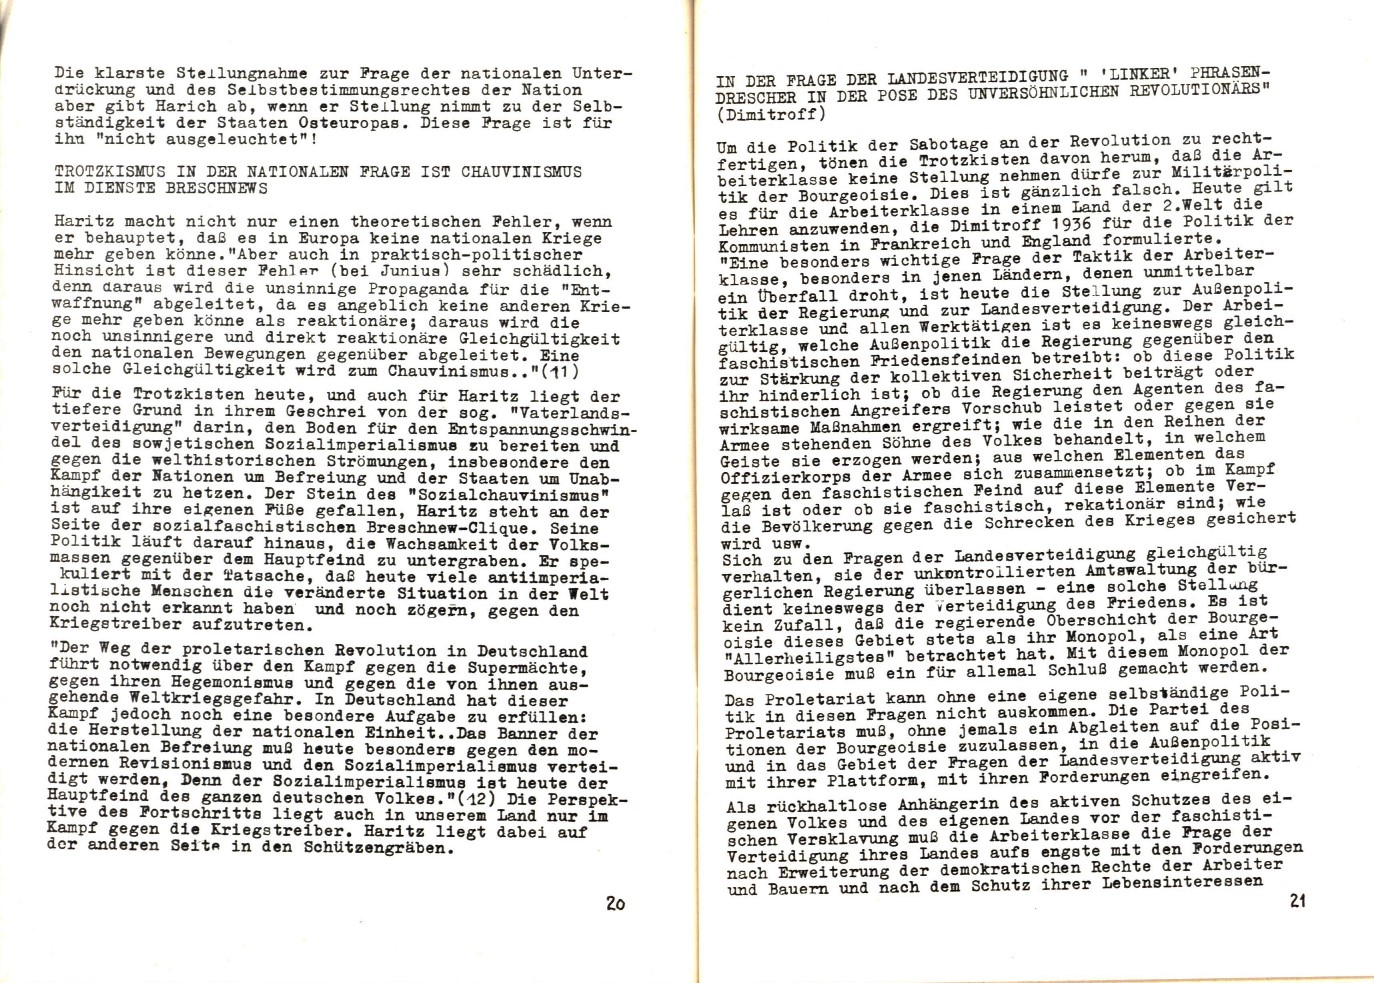 Berlin_KSV_1975_Dokumente_der_SAZ_12